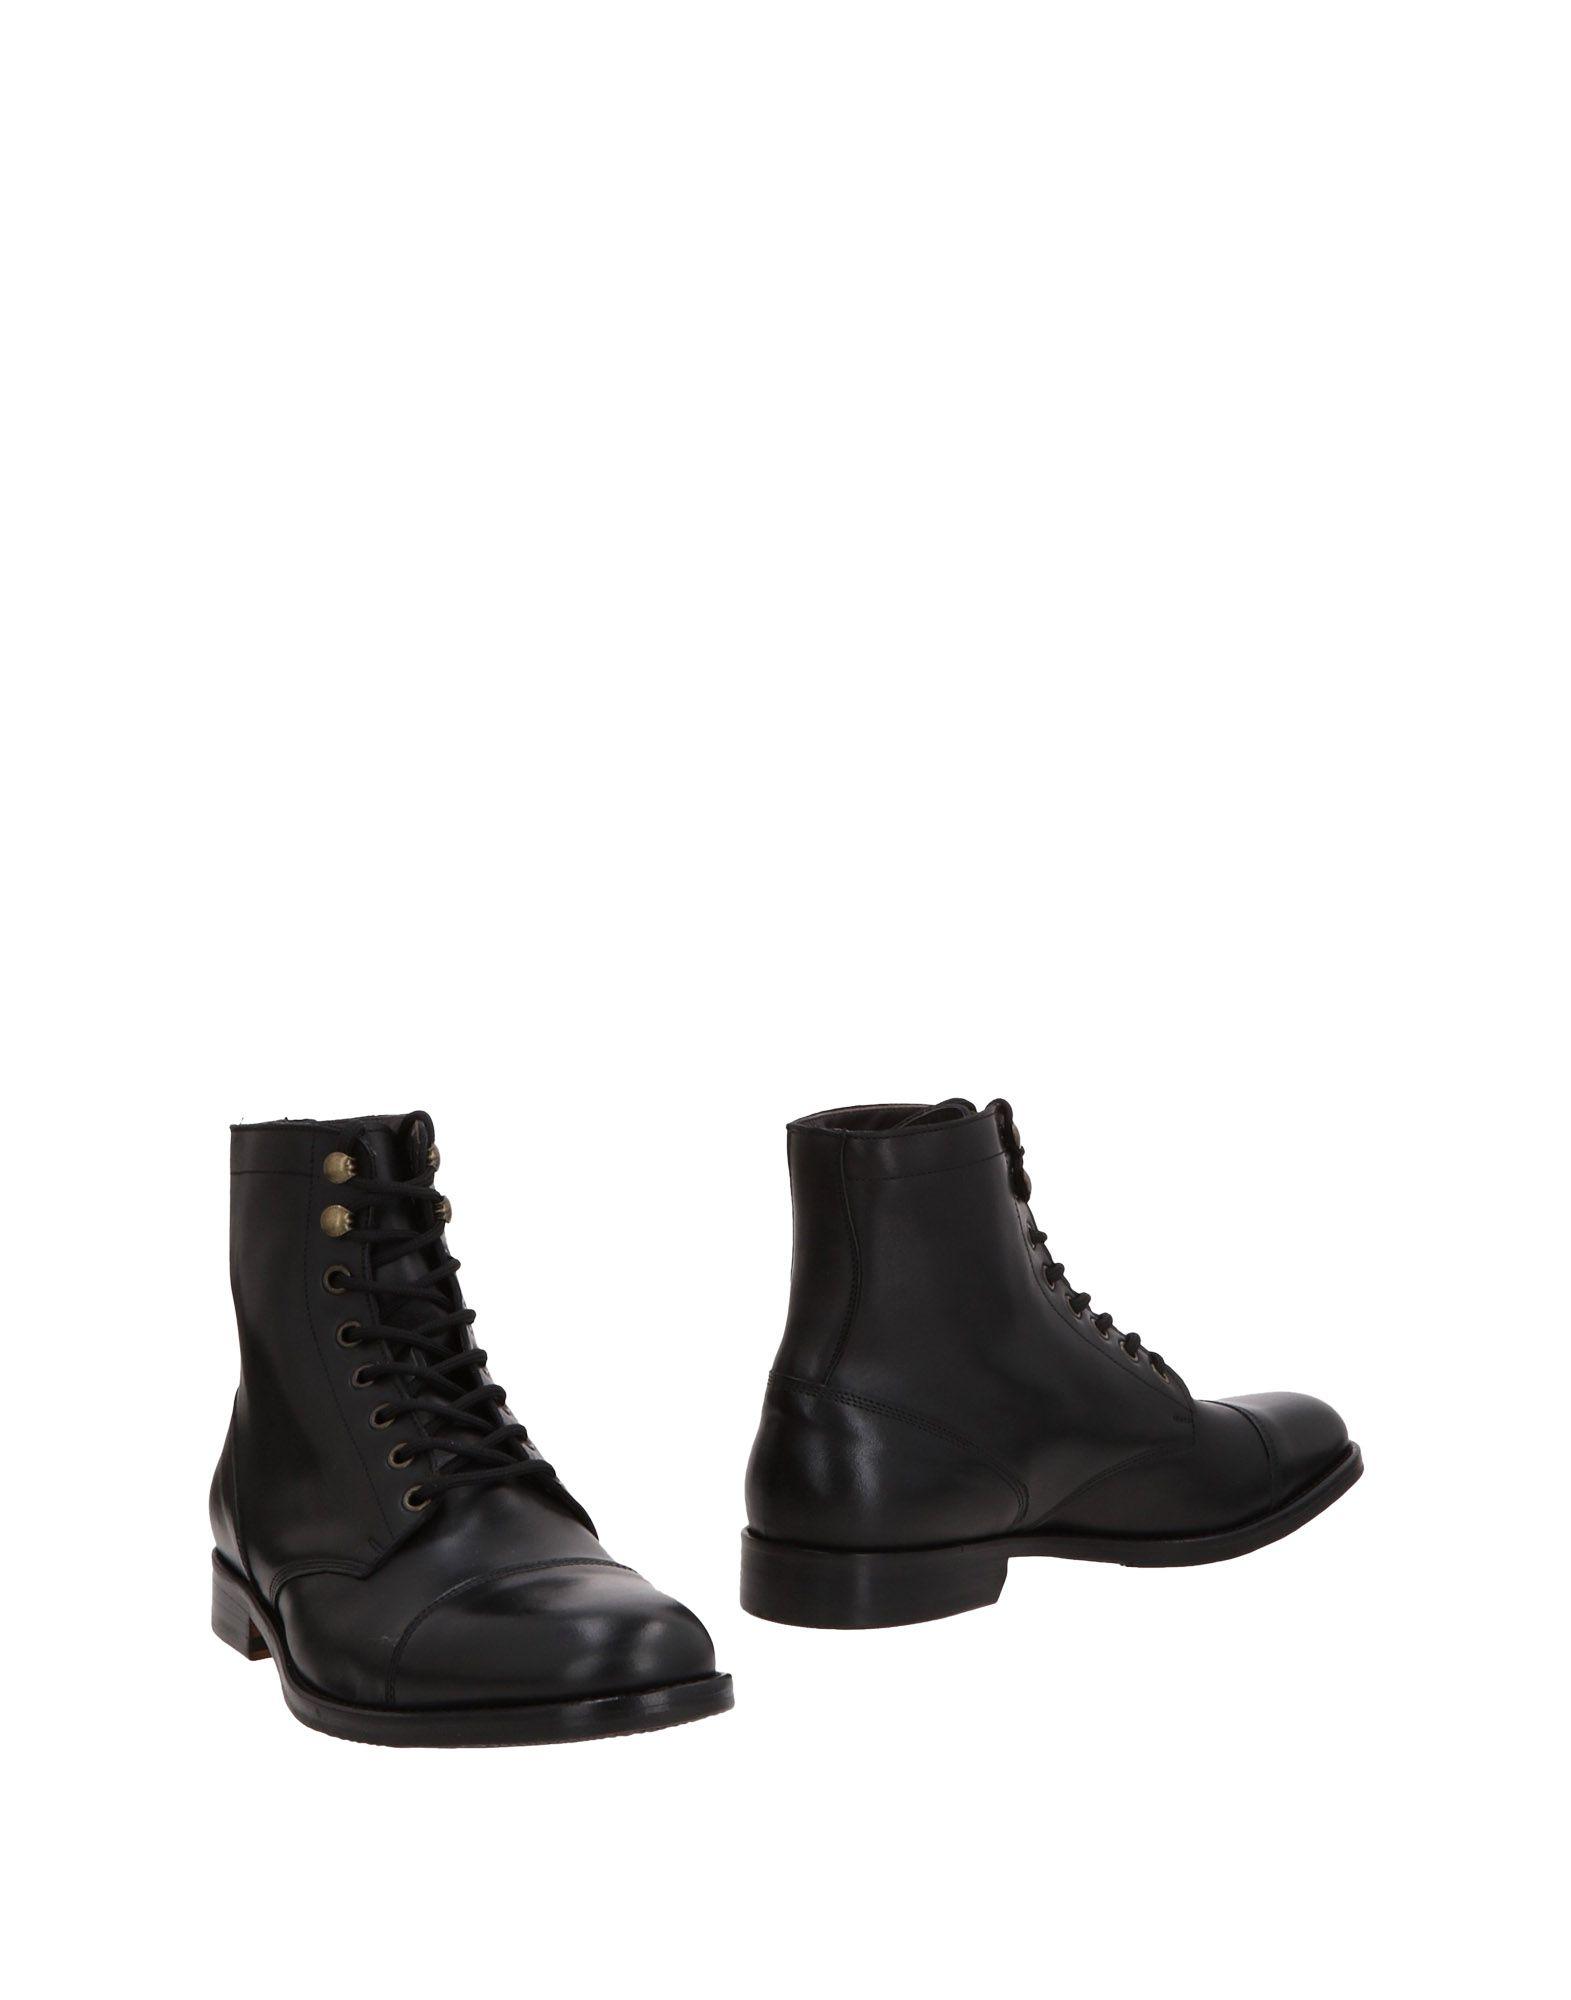 BRIAN DALES Полусапоги и высокие ботинки brian atwood полусапоги и высокие ботинки